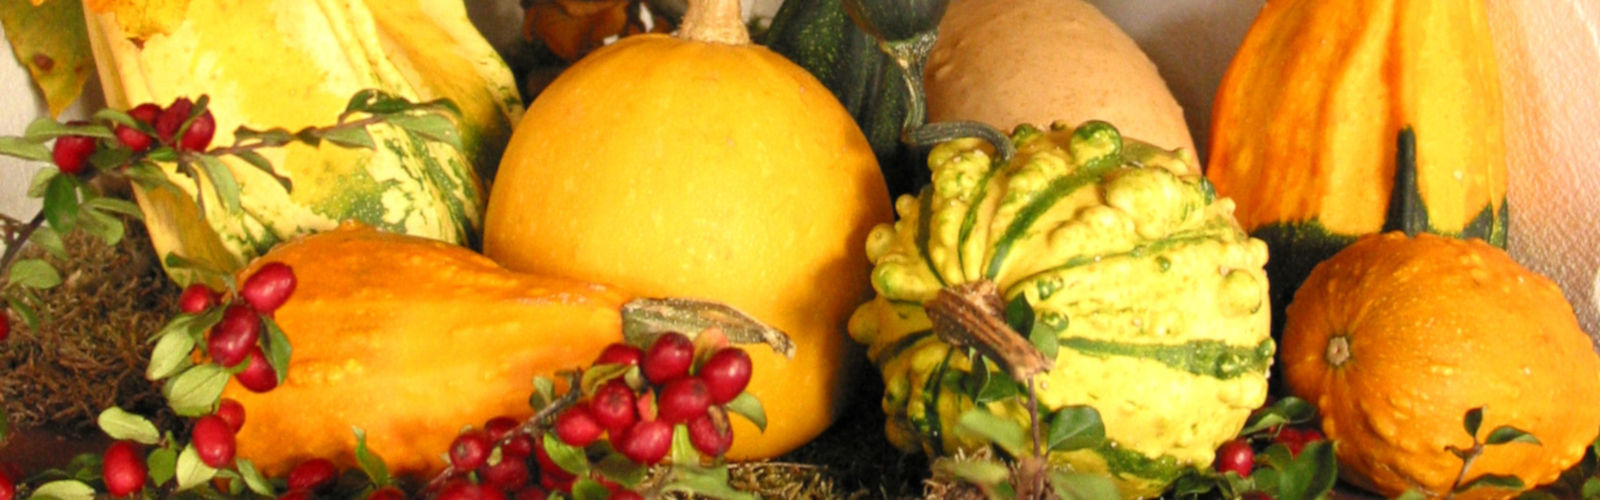 145--topimg-pumpkin